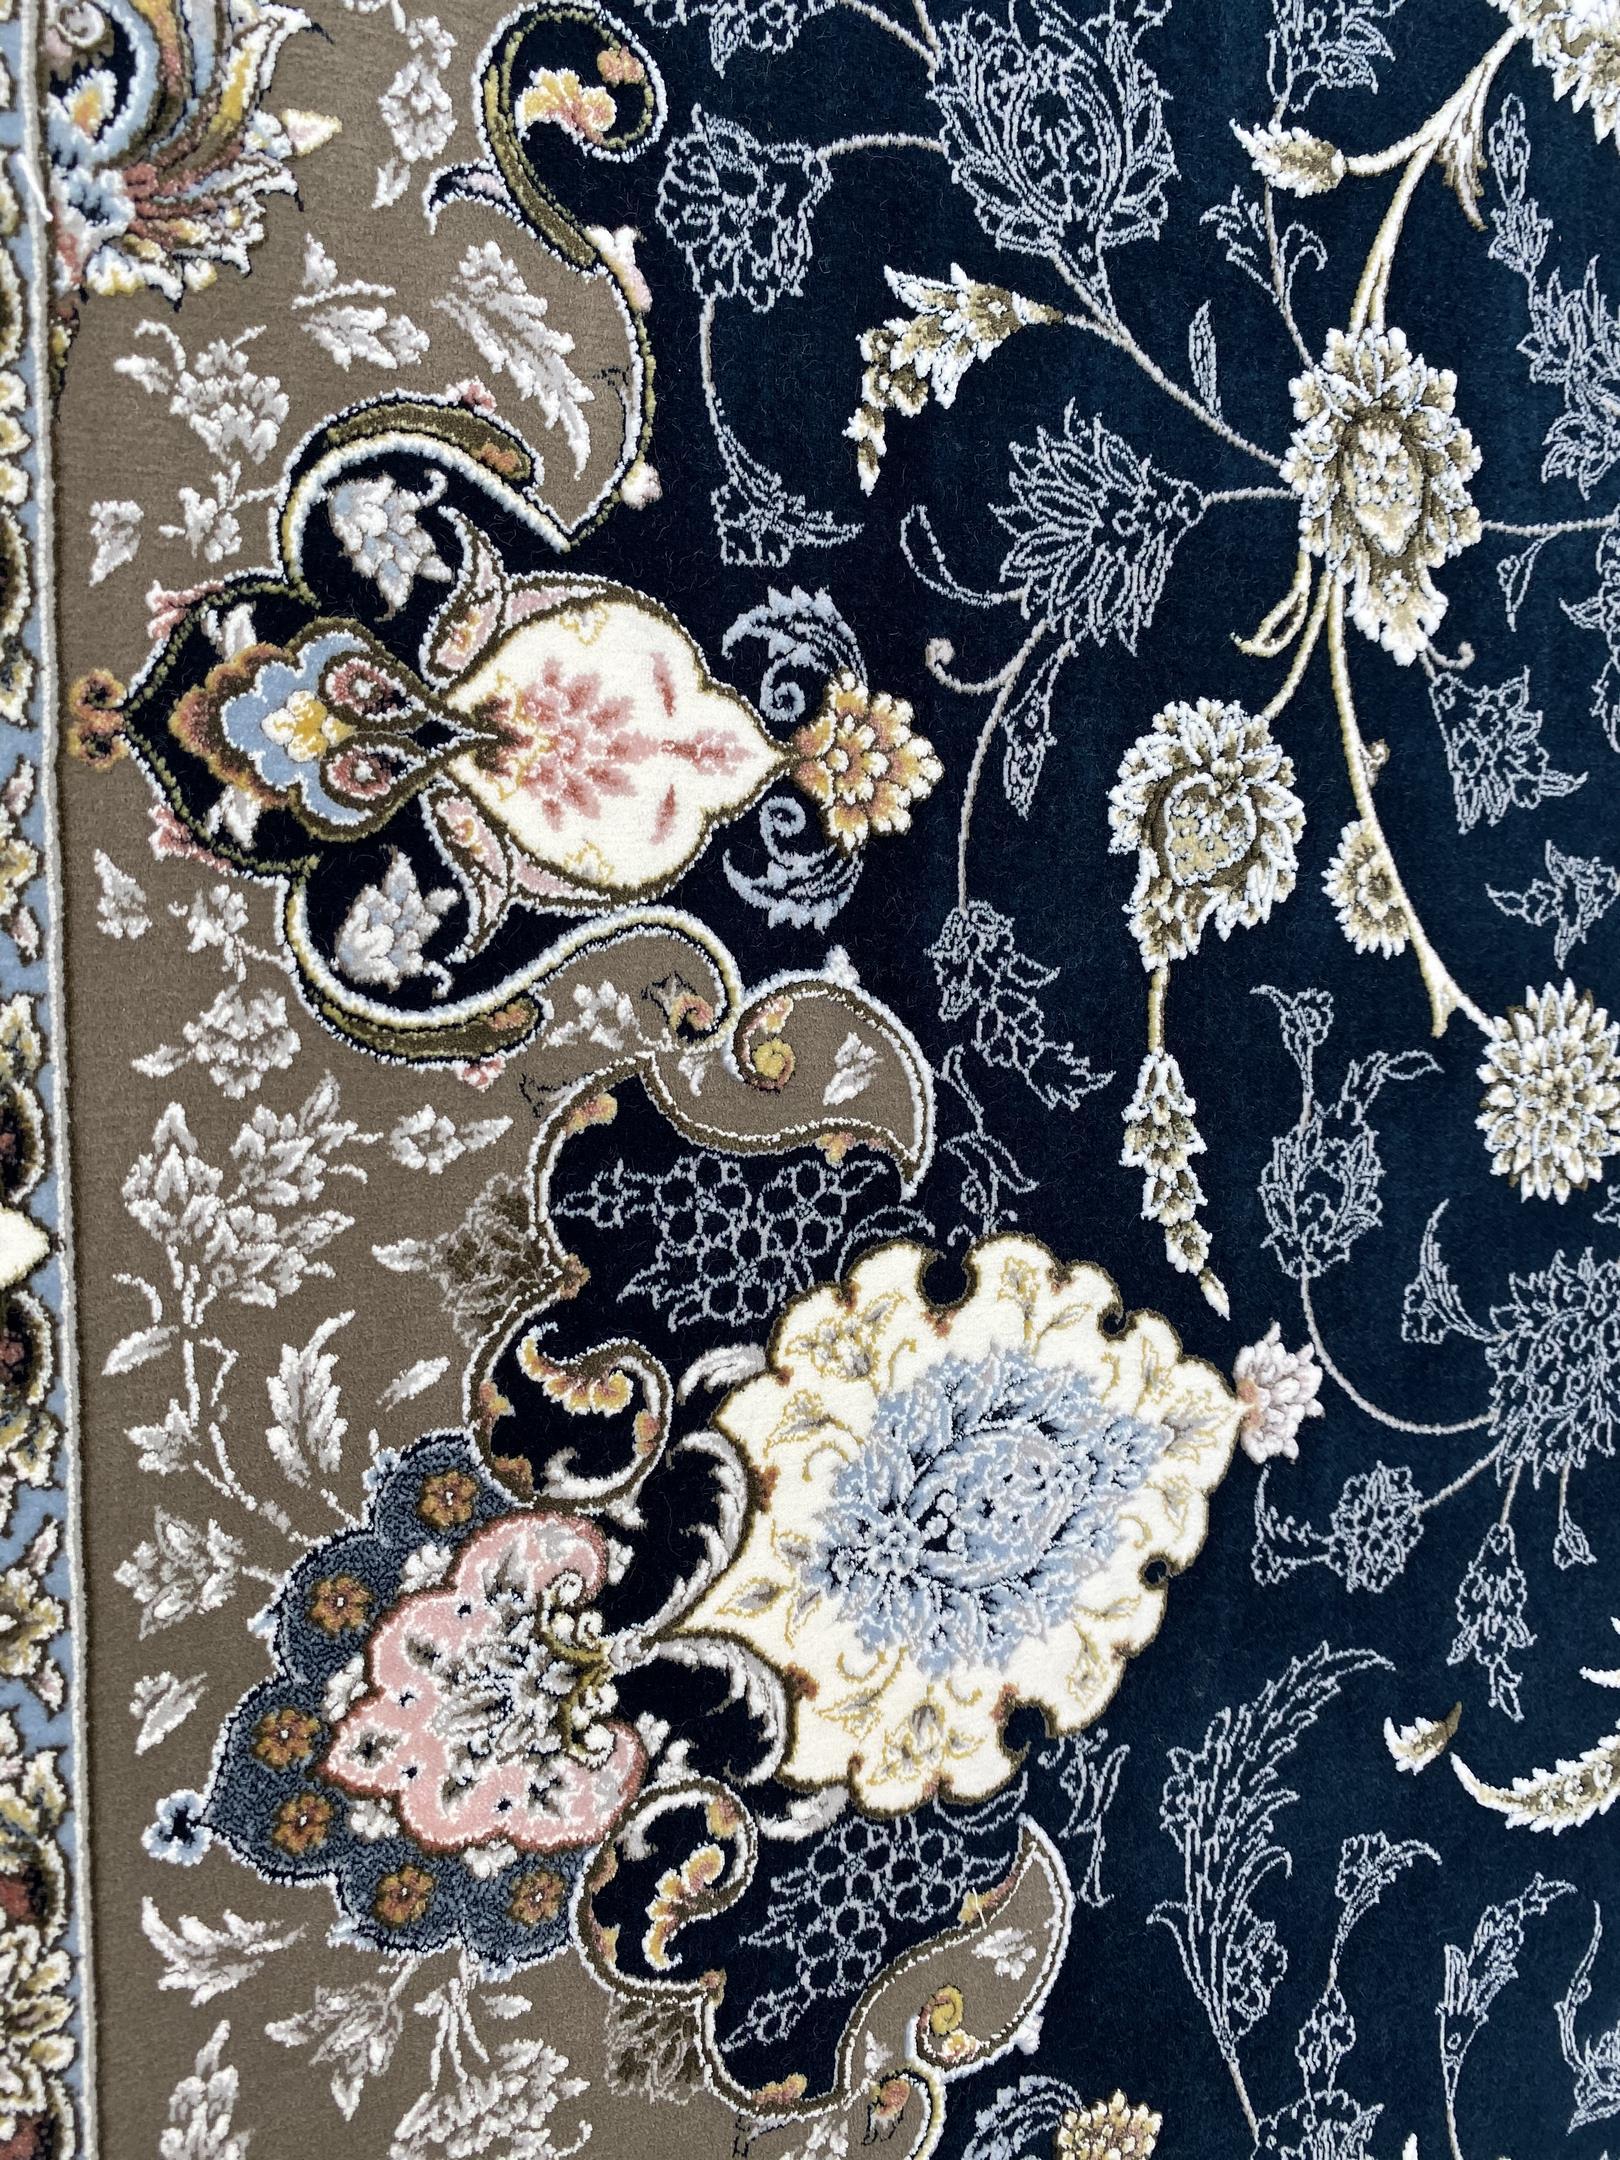 طرح اصفهان 1500 شانه